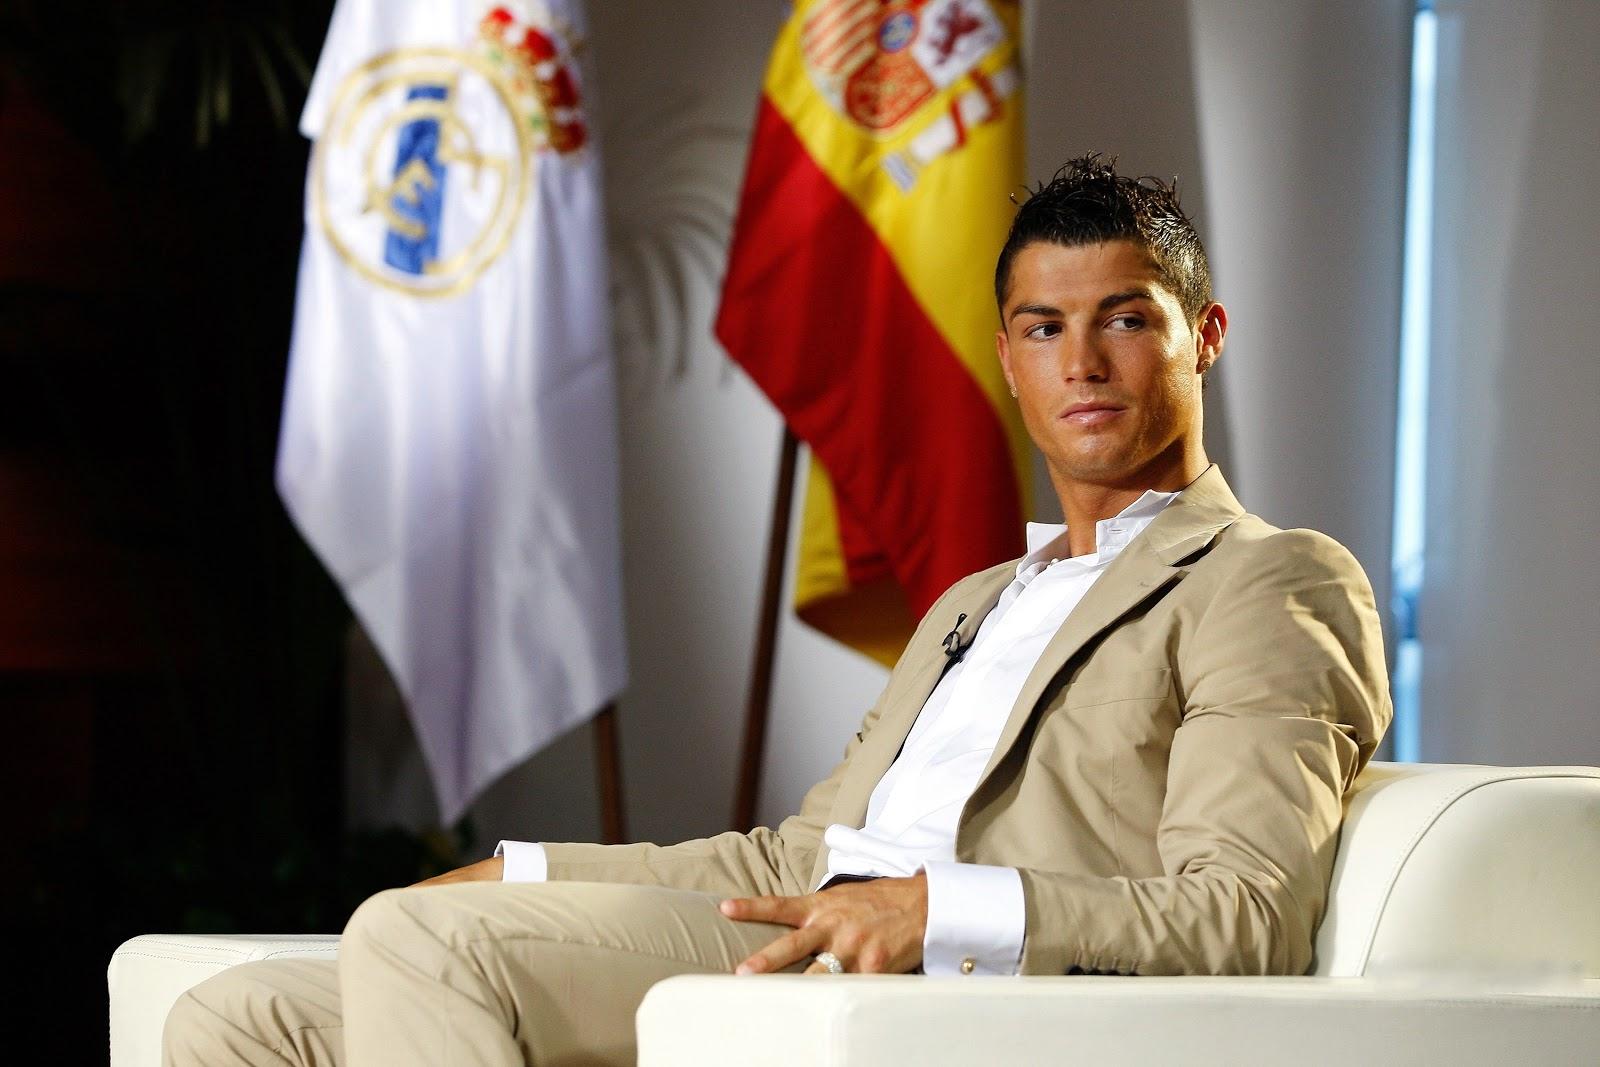 http://1.bp.blogspot.com/-ommbHtPVFZE/TwQUJ4LXB9I/AAAAAAAAIXo/cSvug68POdg/s1600/Cristiano+Ronaldo++10.jpg